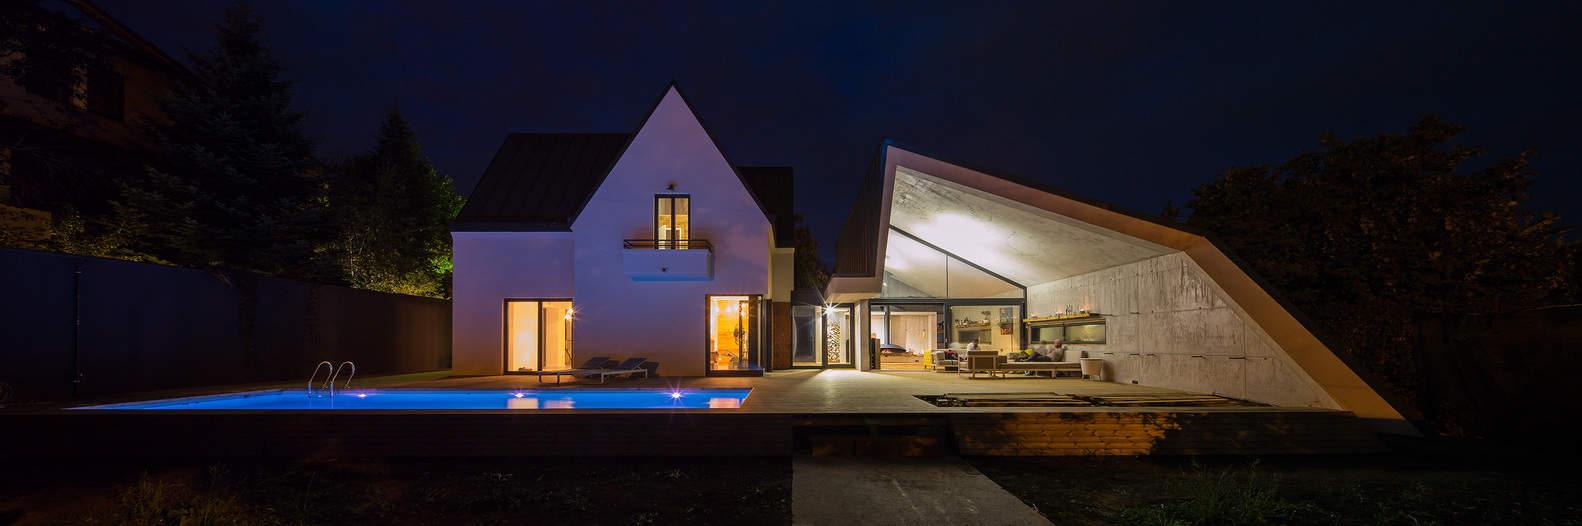 Asymmetrical Concrete Architecture